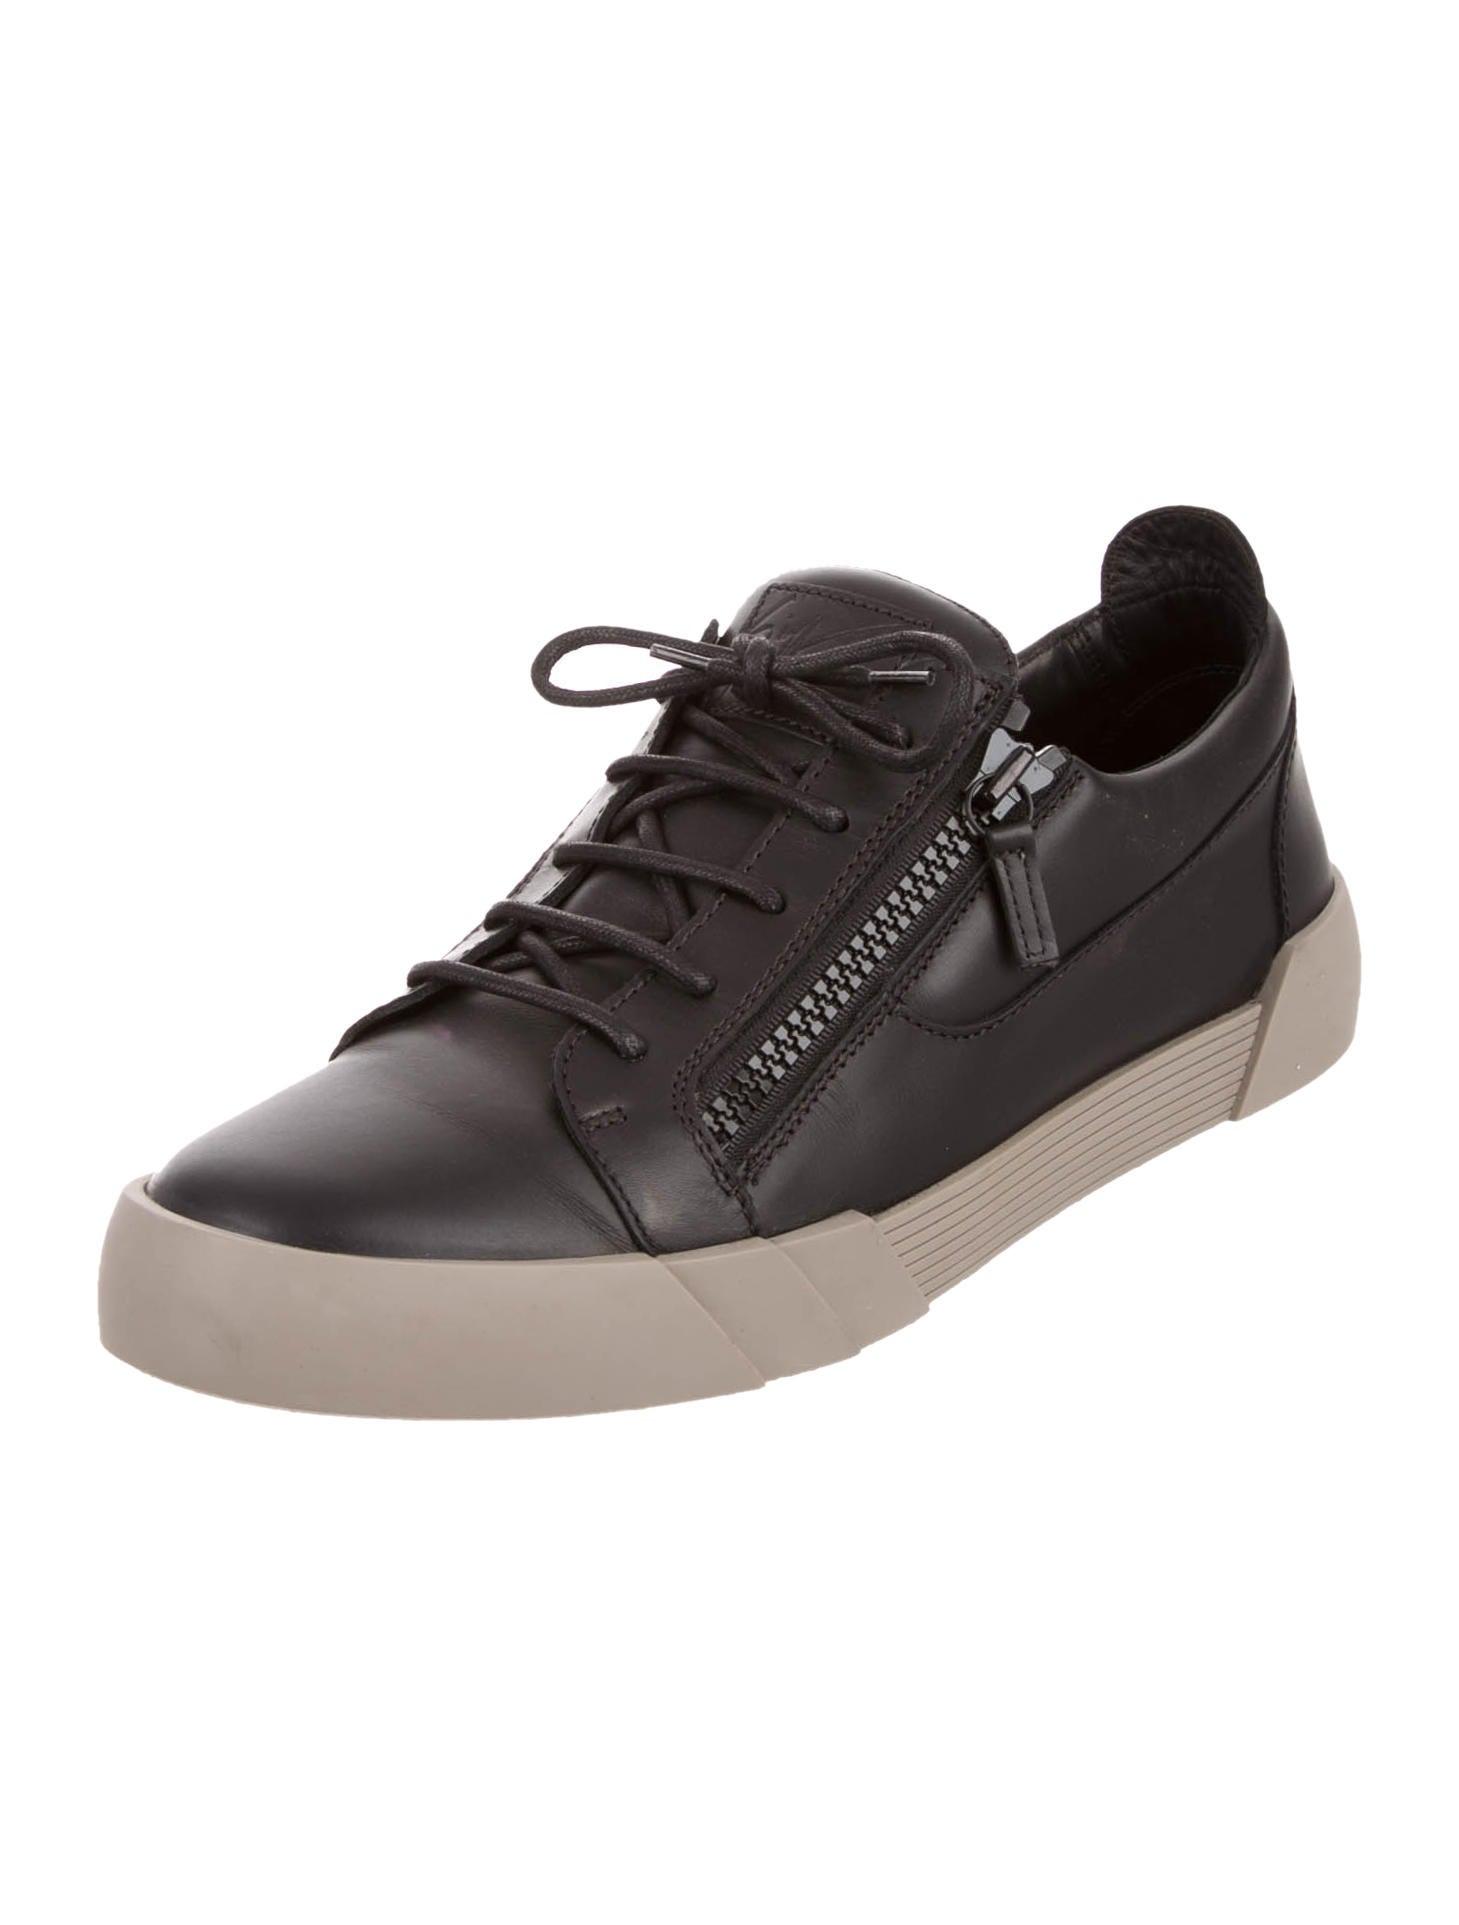 7754ebc9e0 Cheap Giuseppe Shoes Nz Green Wedding Shoes   Portal for Tenders